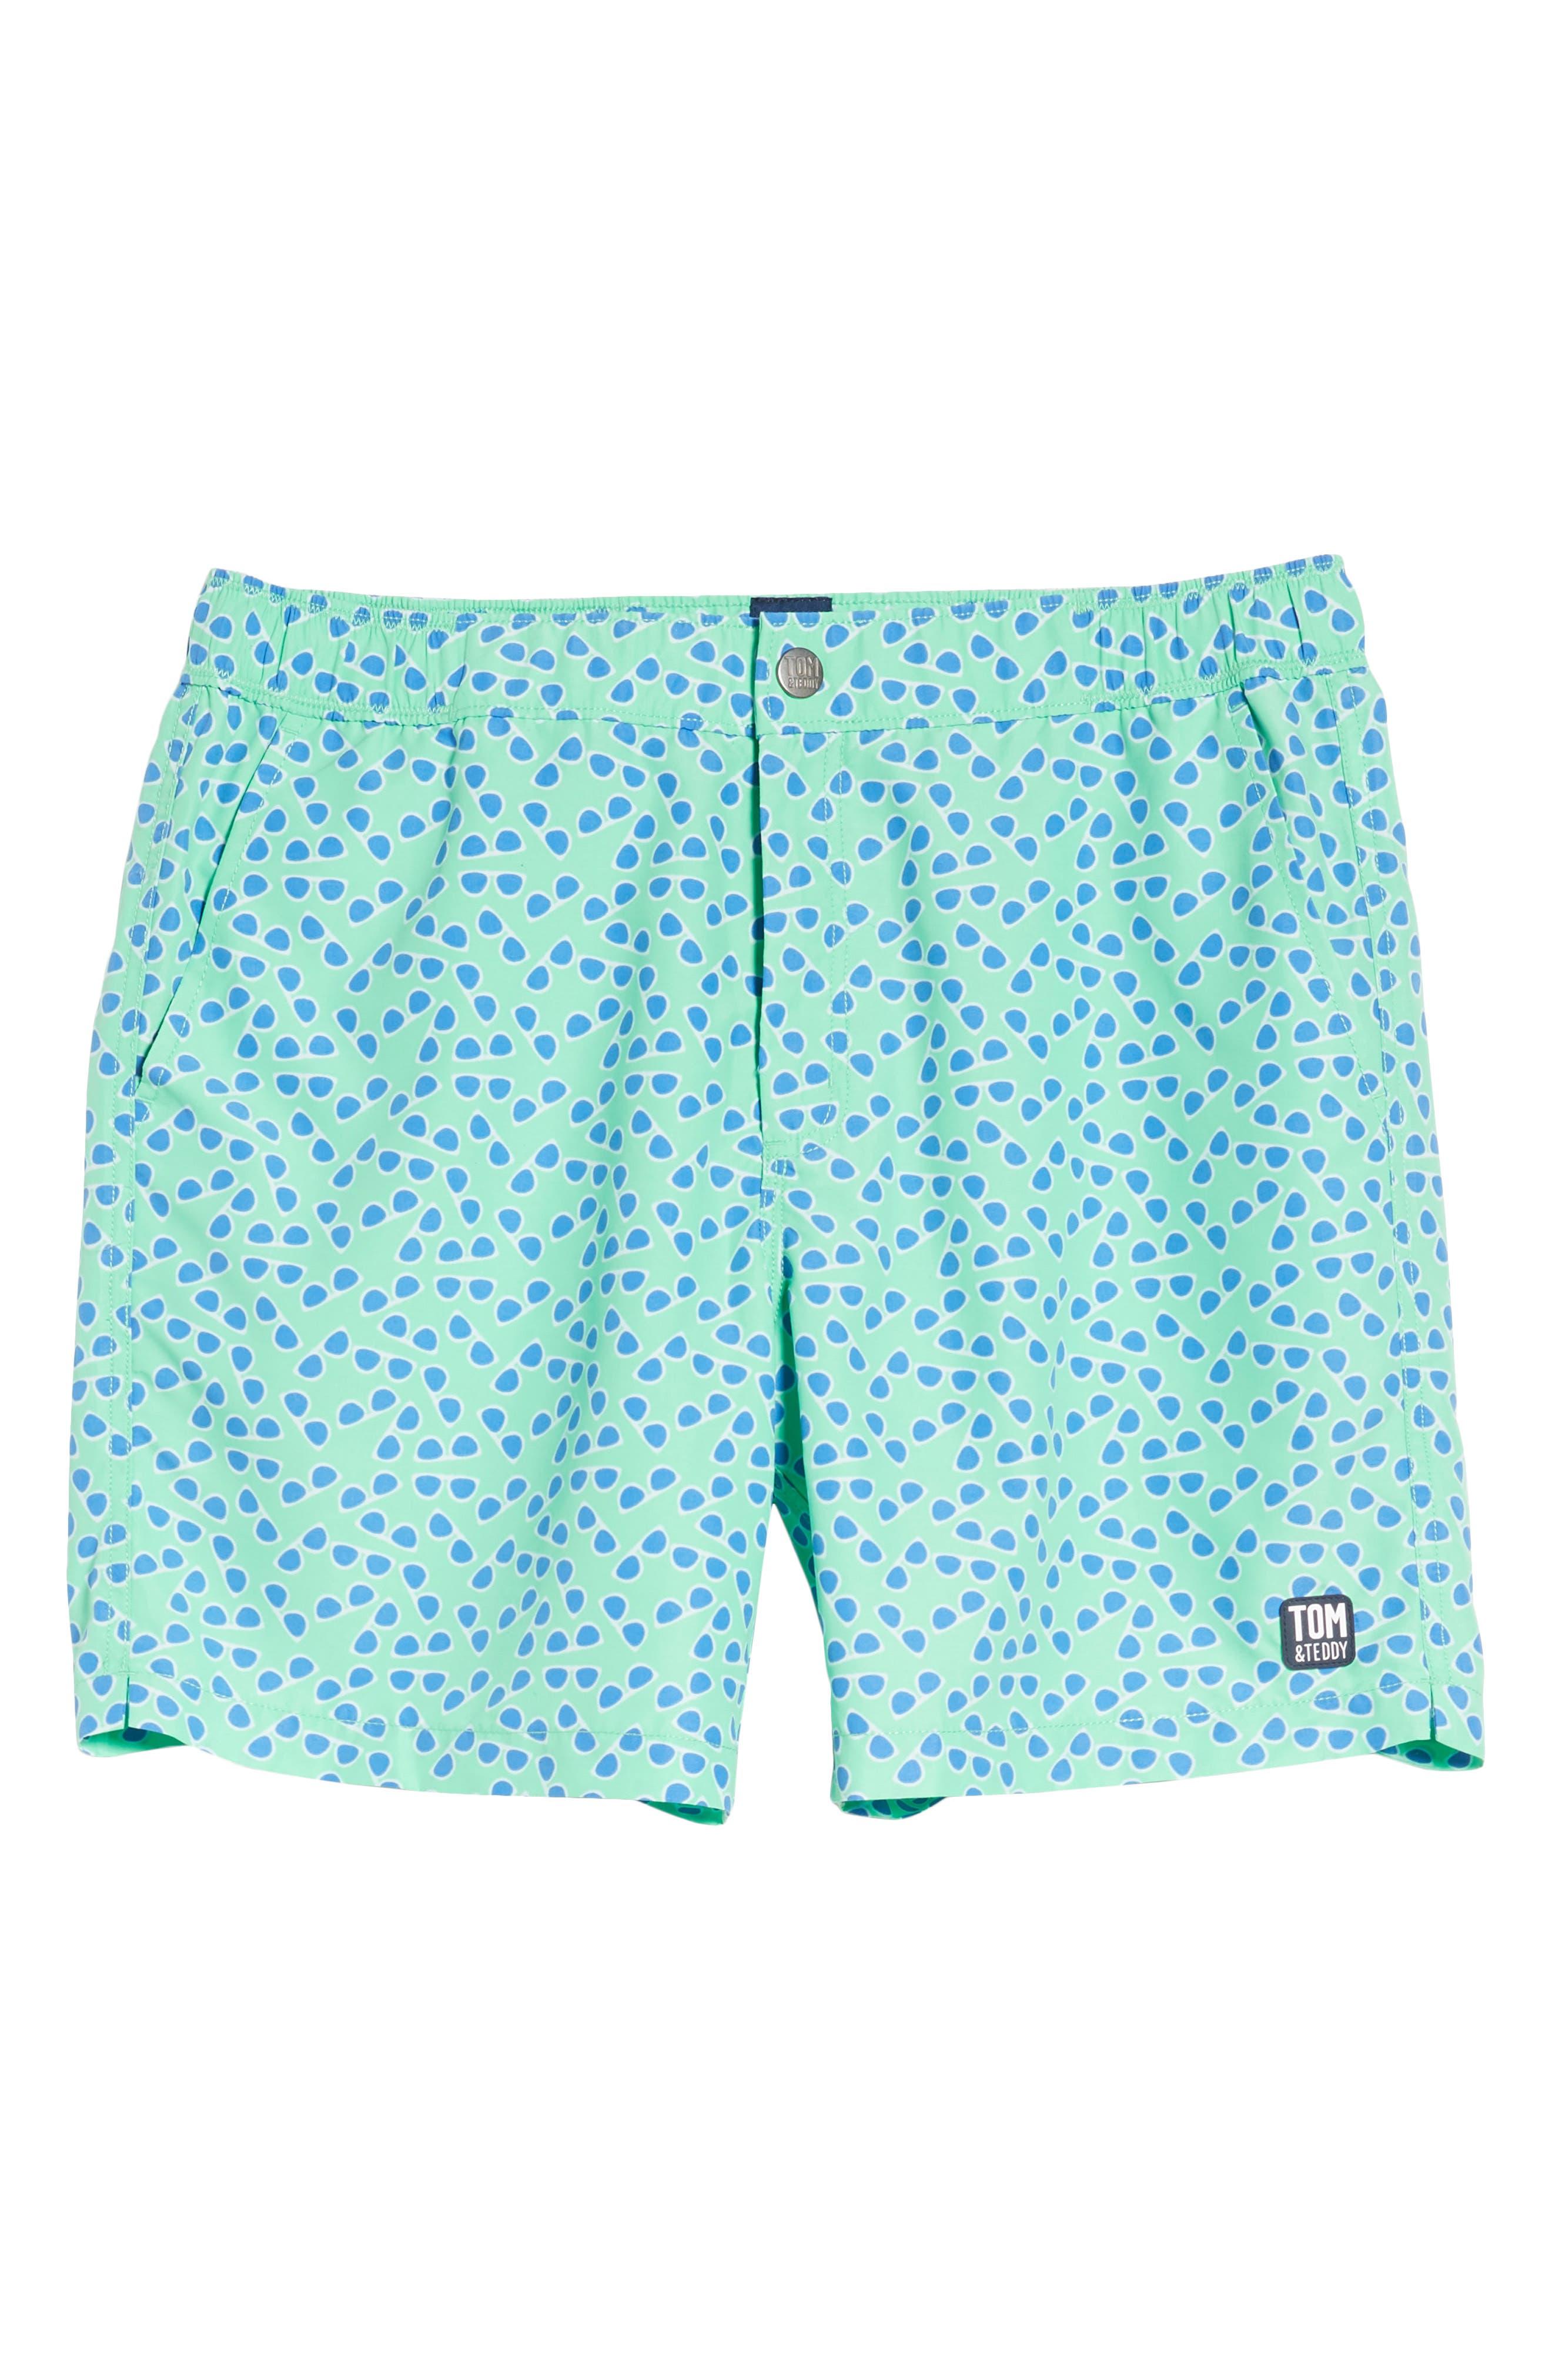 Sunglasses Print Swim Trunks,                             Alternate thumbnail 6, color,                             Spring Green